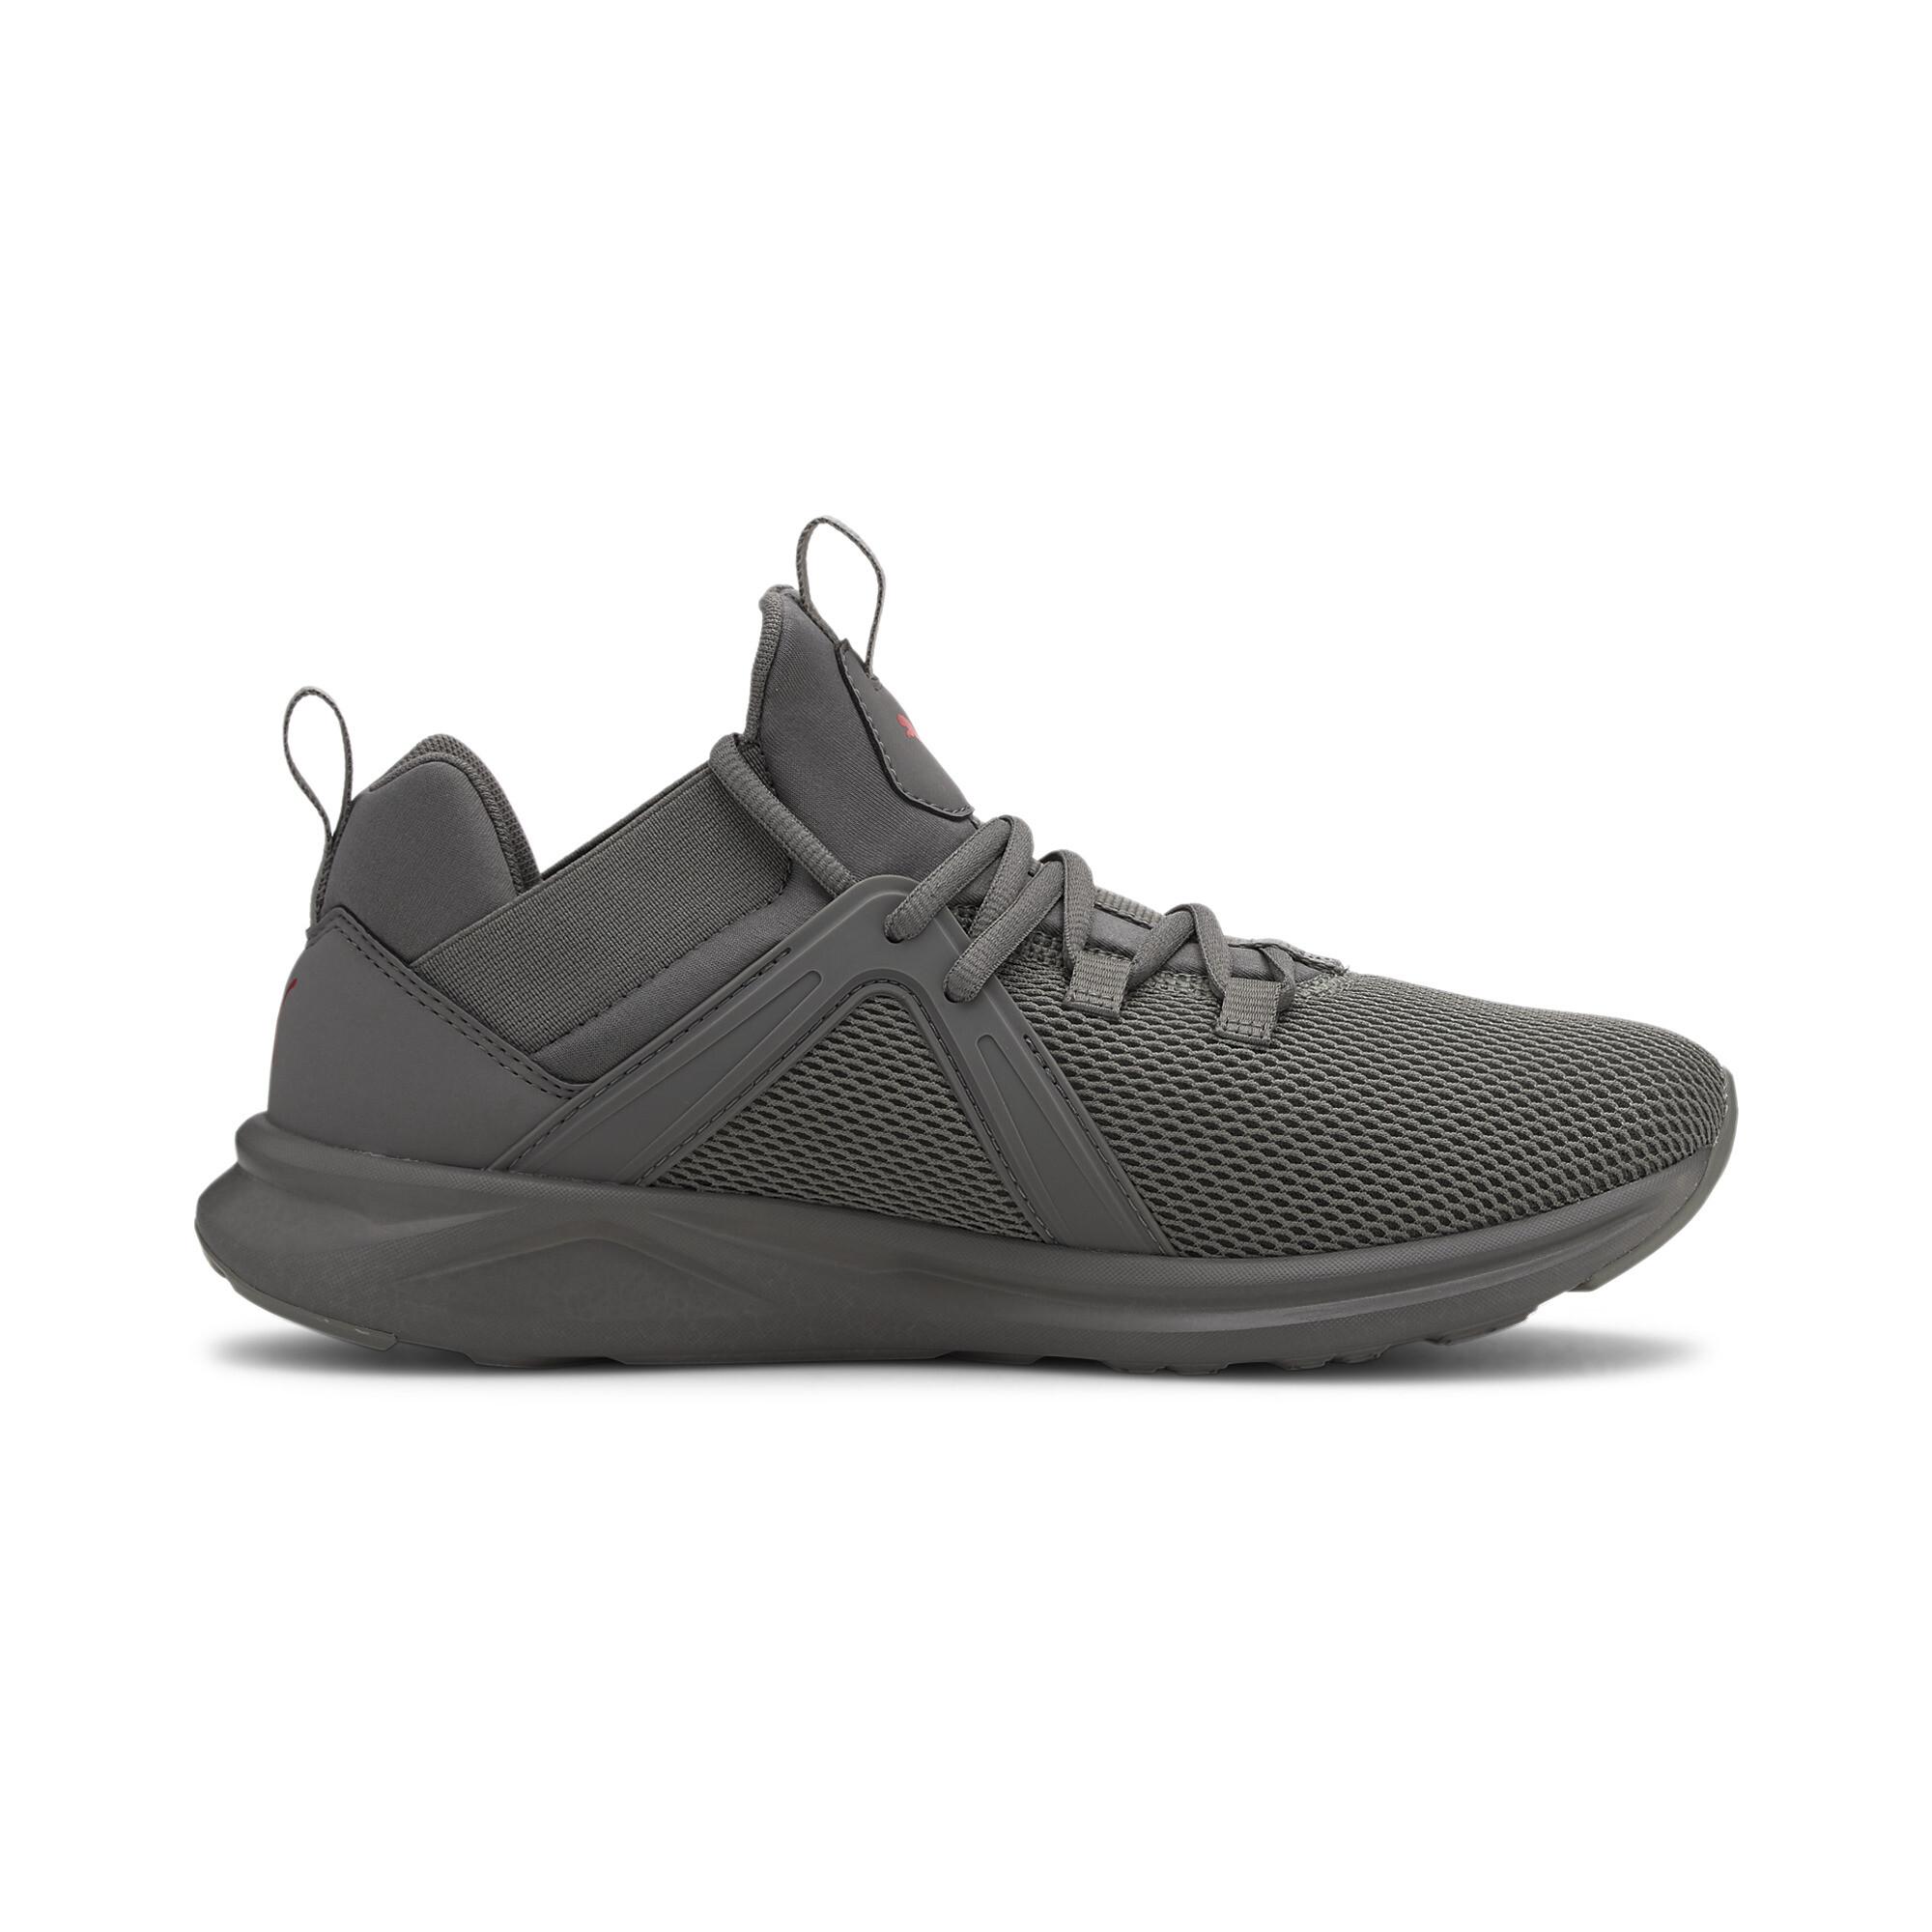 PUMA-Men-039-s-Enzo-2-Training-Shoes thumbnail 33